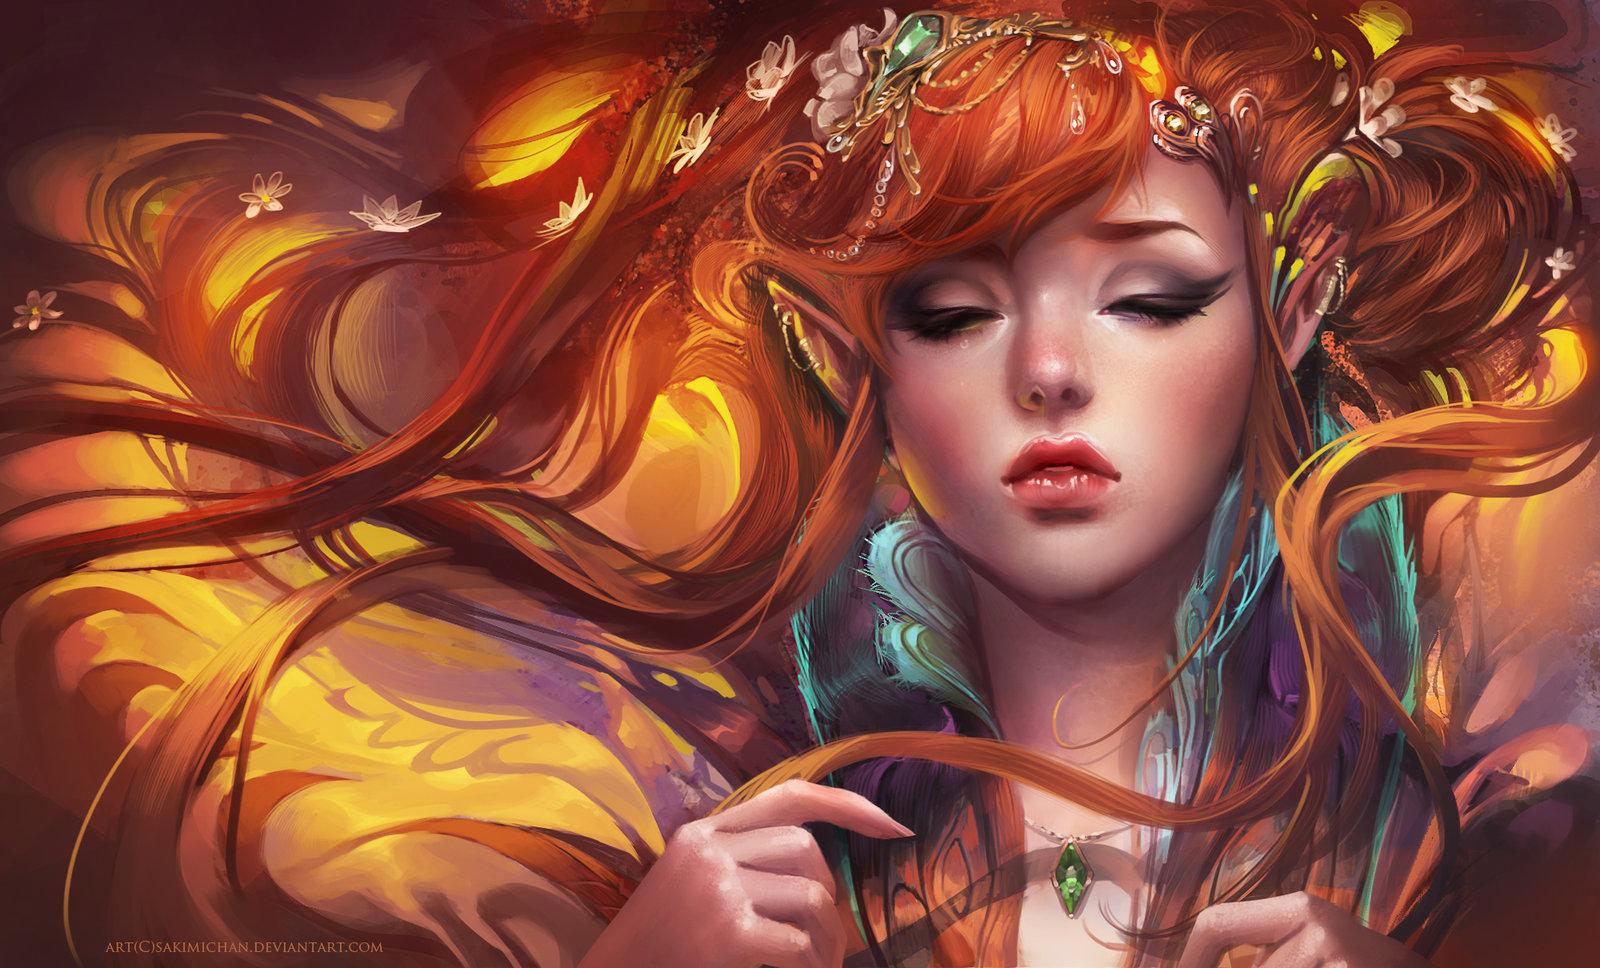 20+ Amazing & Beautiful Digital Art Desktop Wallpapers In